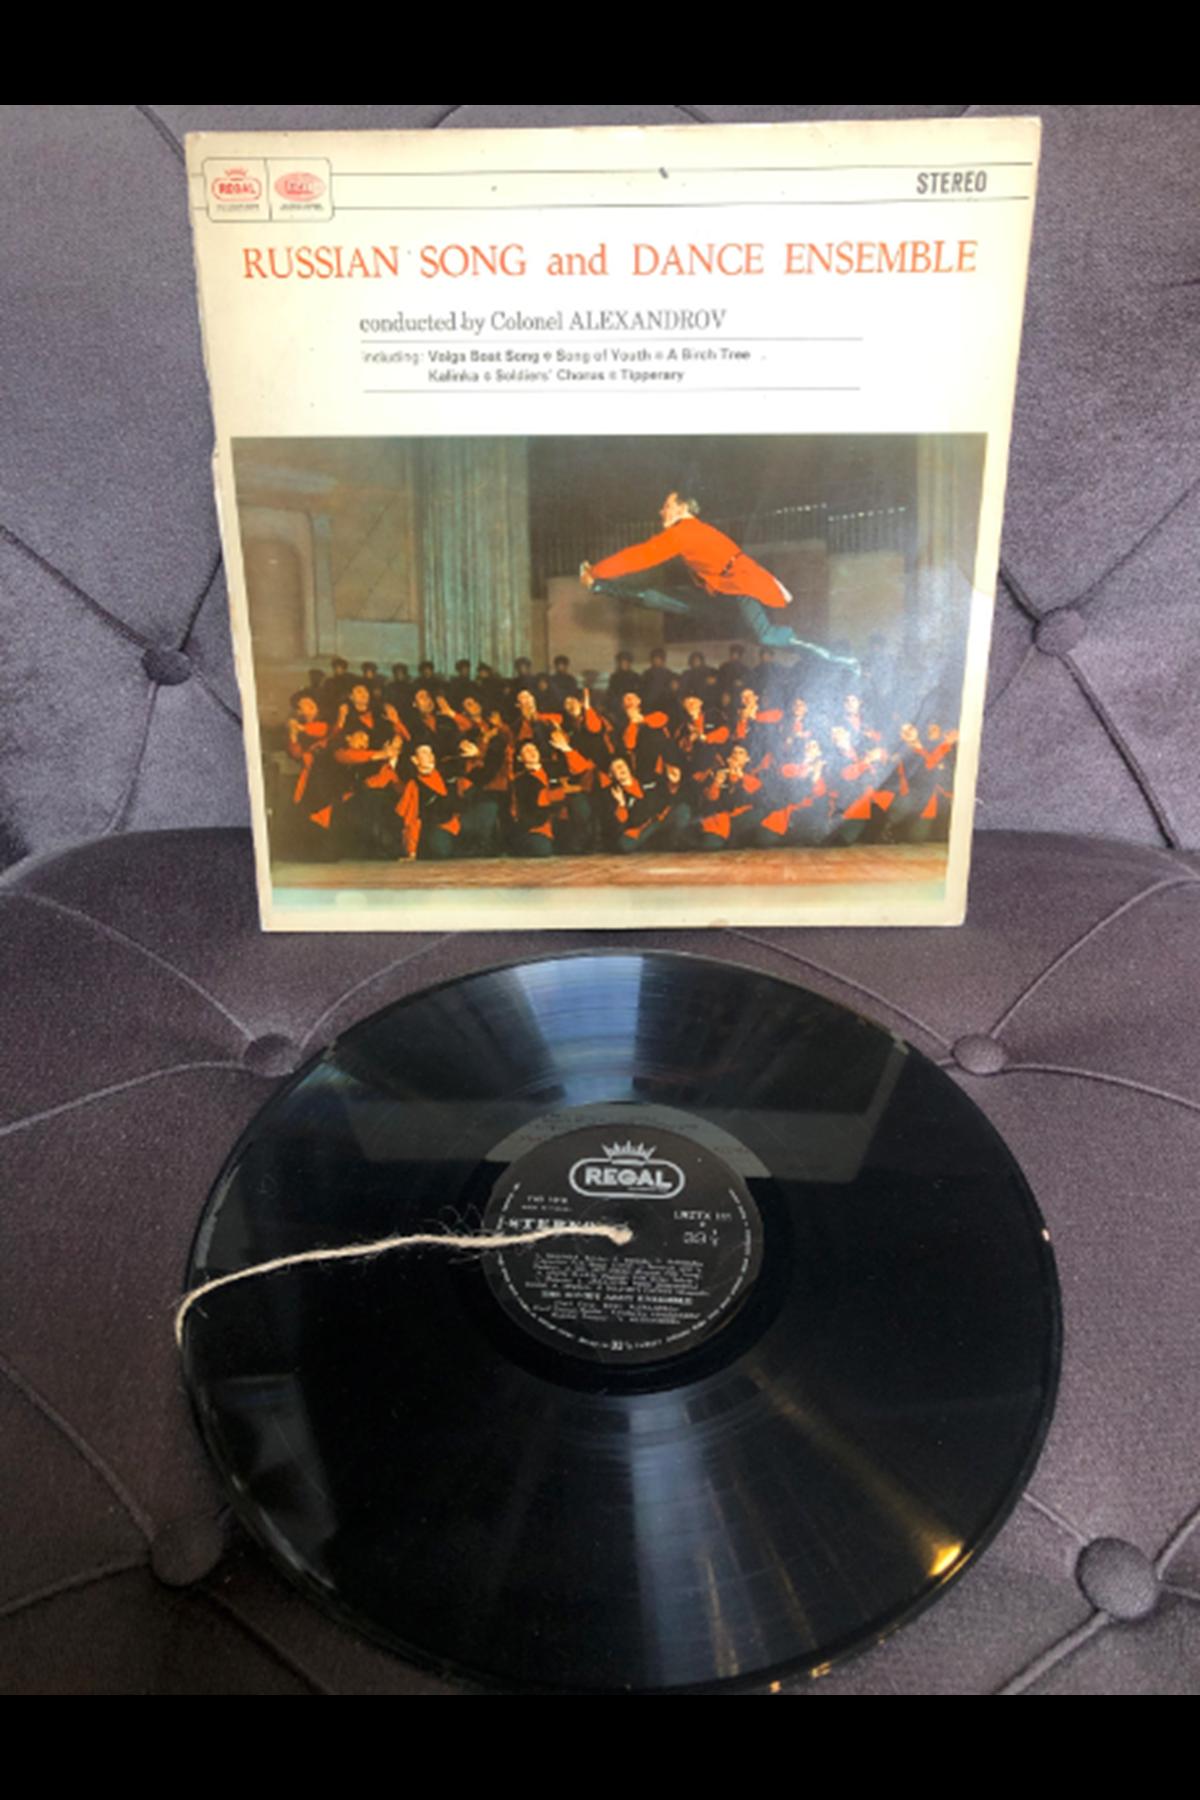 Colonel Alexandrov - Russian Song and Dance Ensemble 33'lük Plak (Orijinal Dönem Baskı)